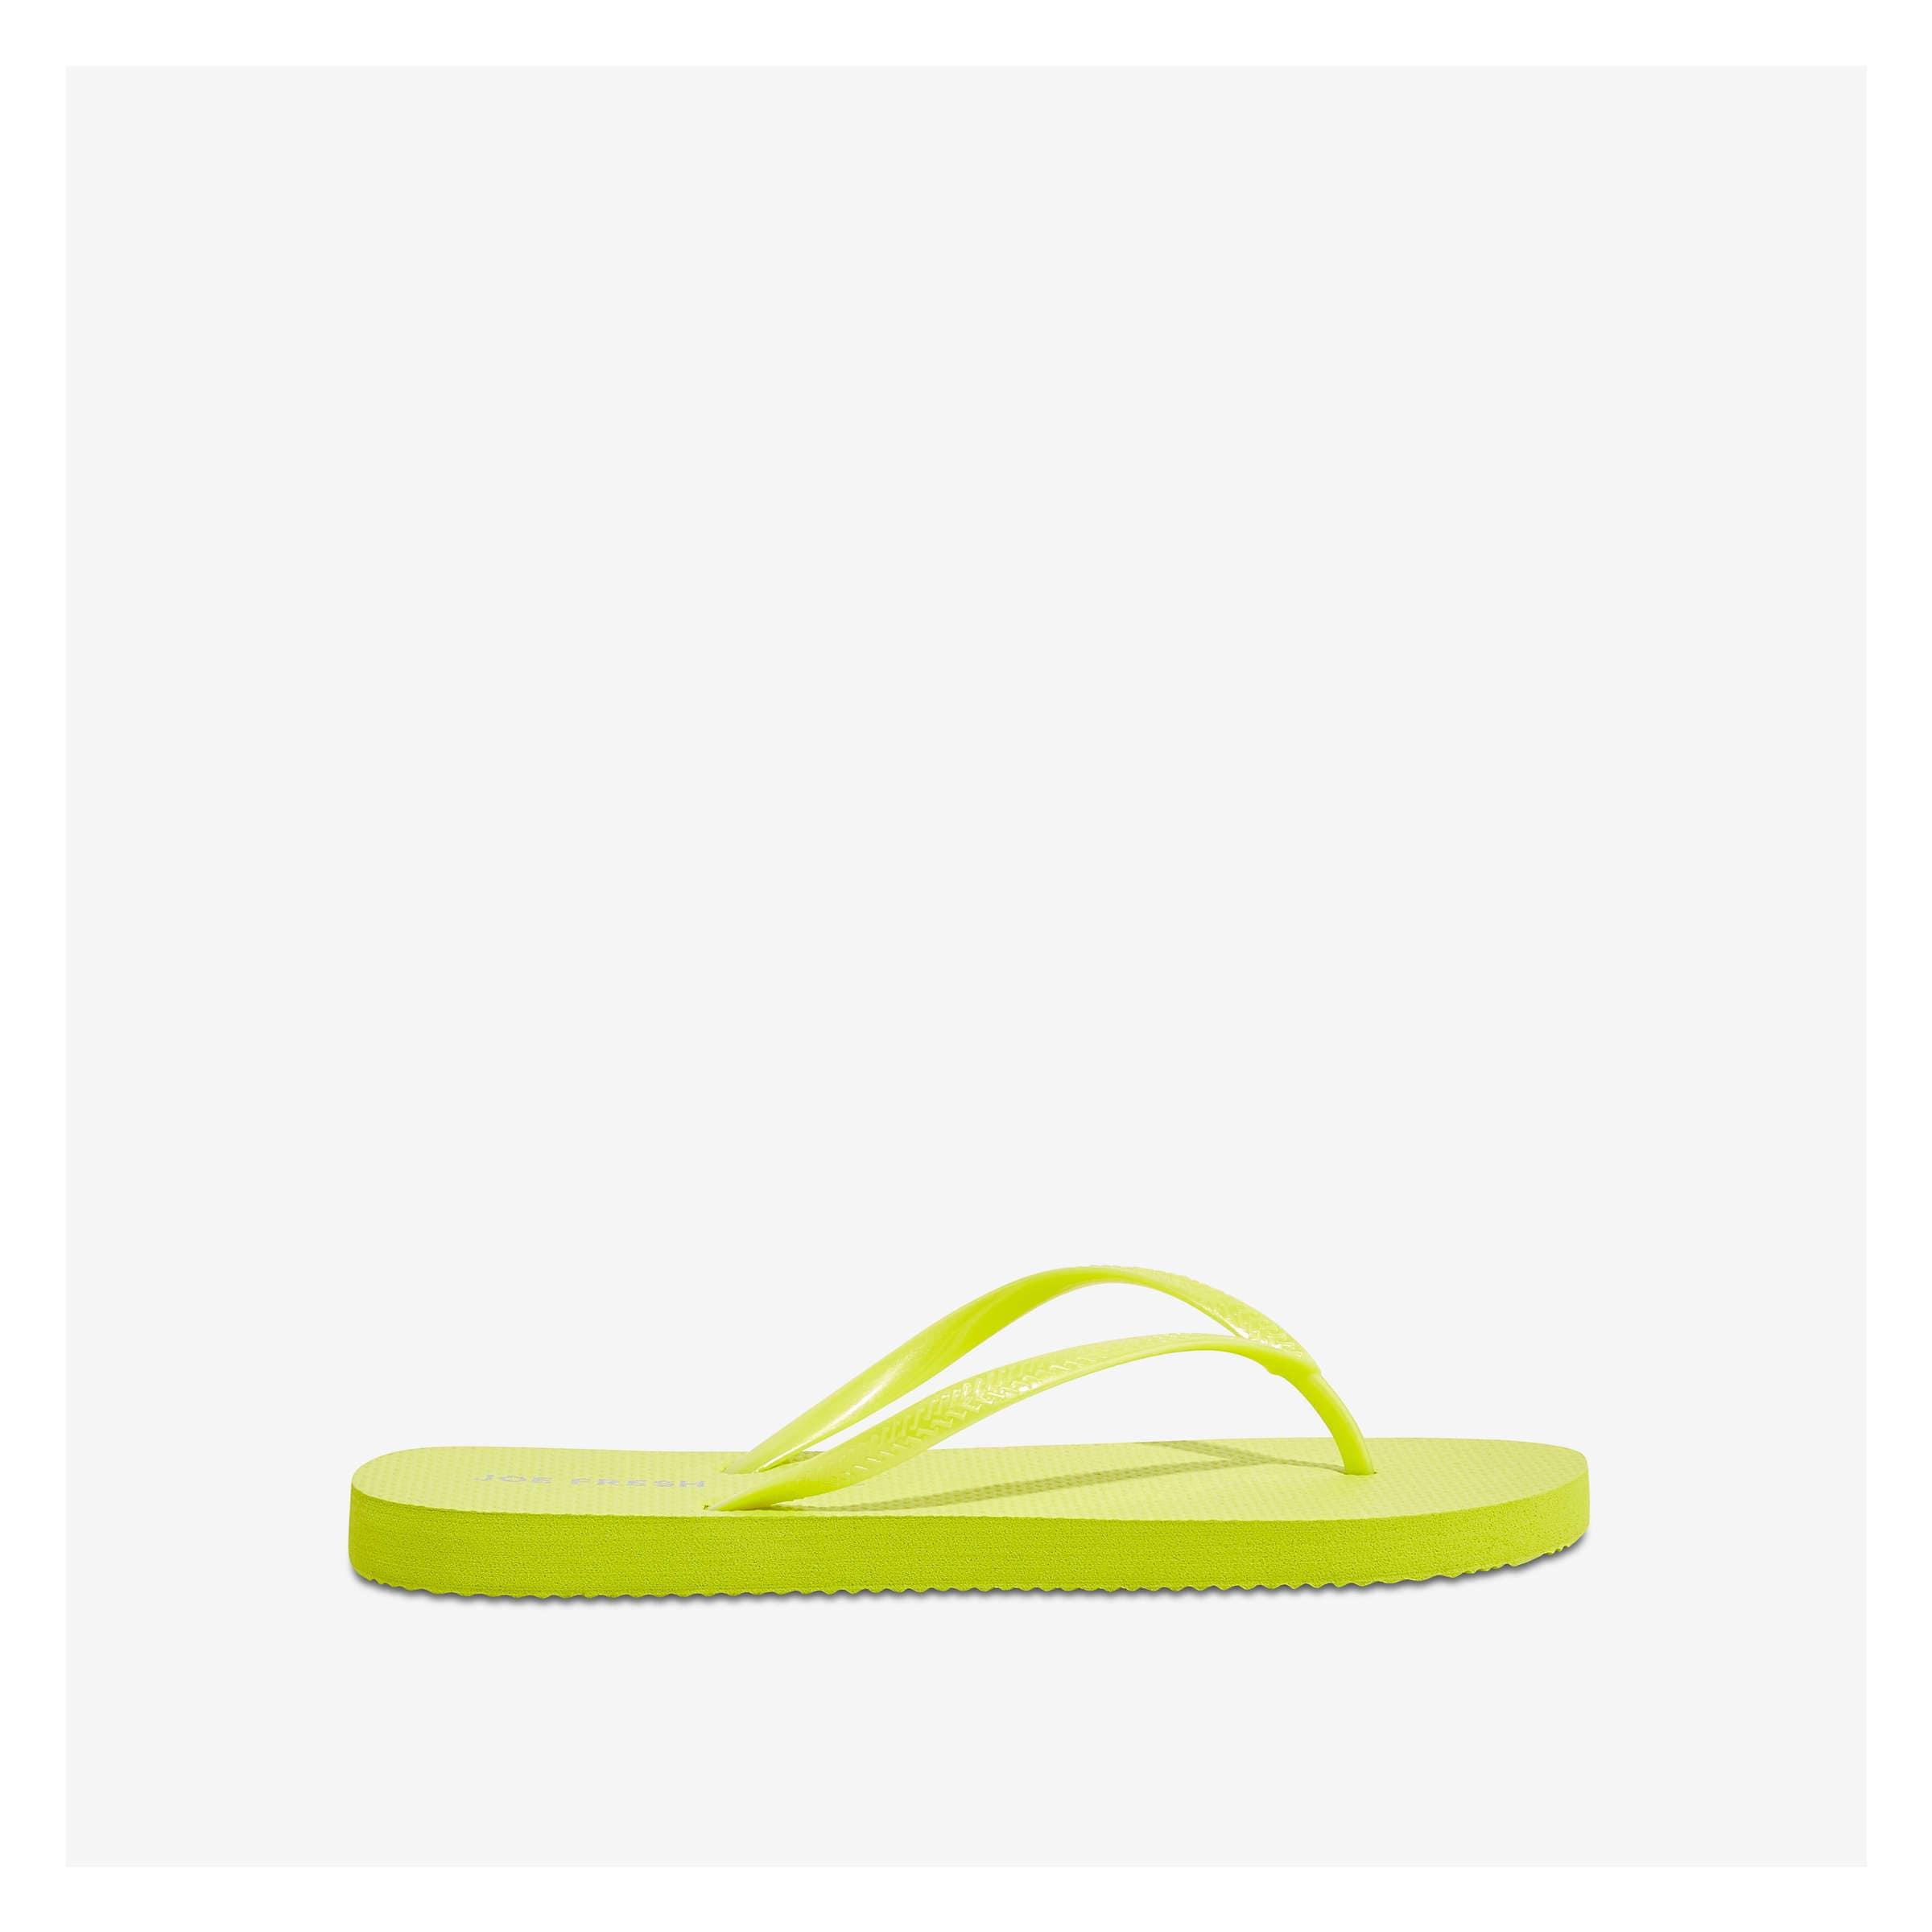 2c77cce18c6 Flip Flops in Dark Neon Green from Joe Fresh